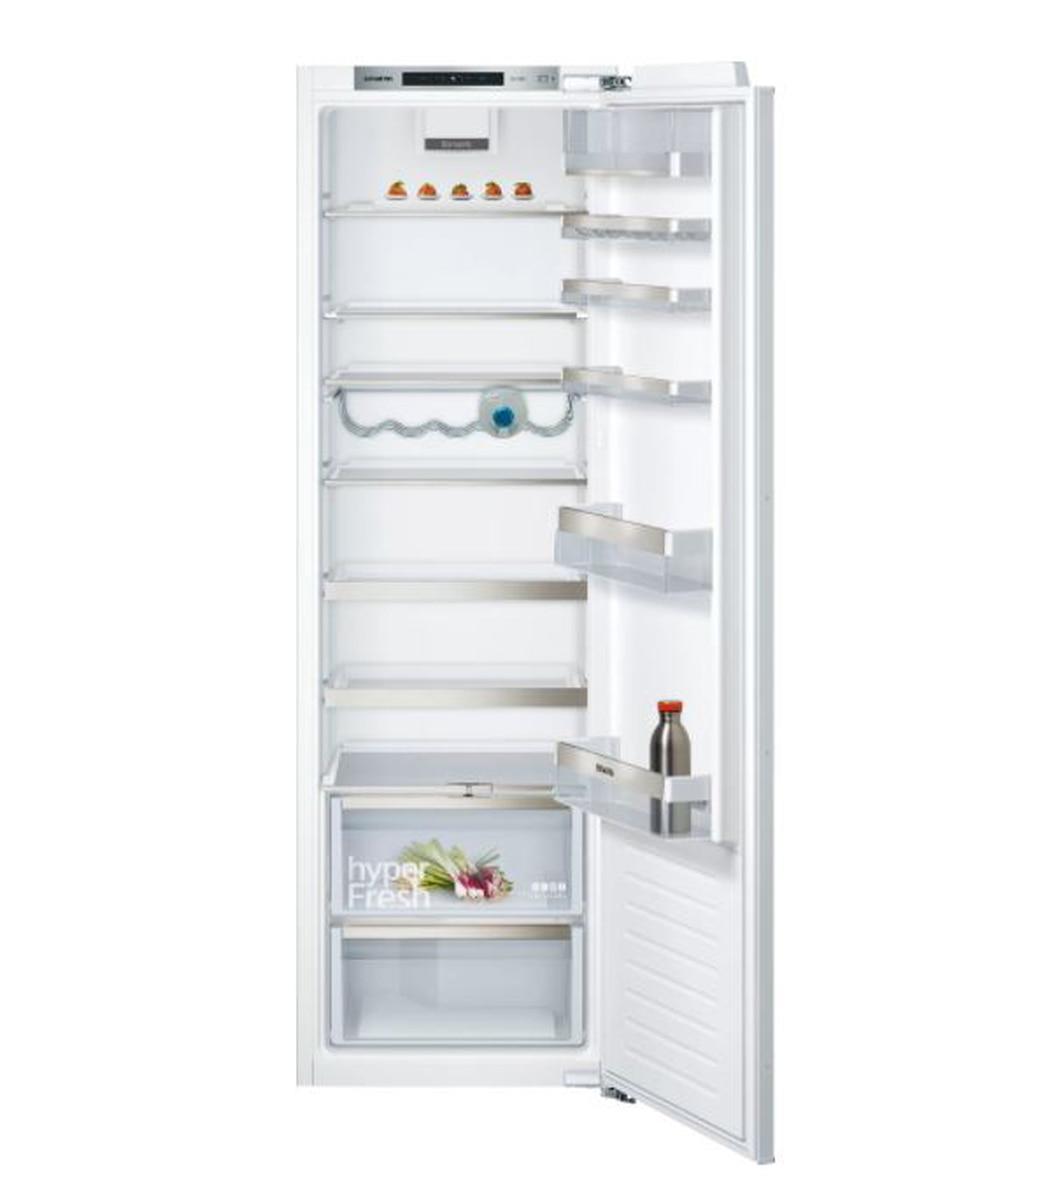 Siemens Integrert kjøleskapiQ500 KI81RADE0